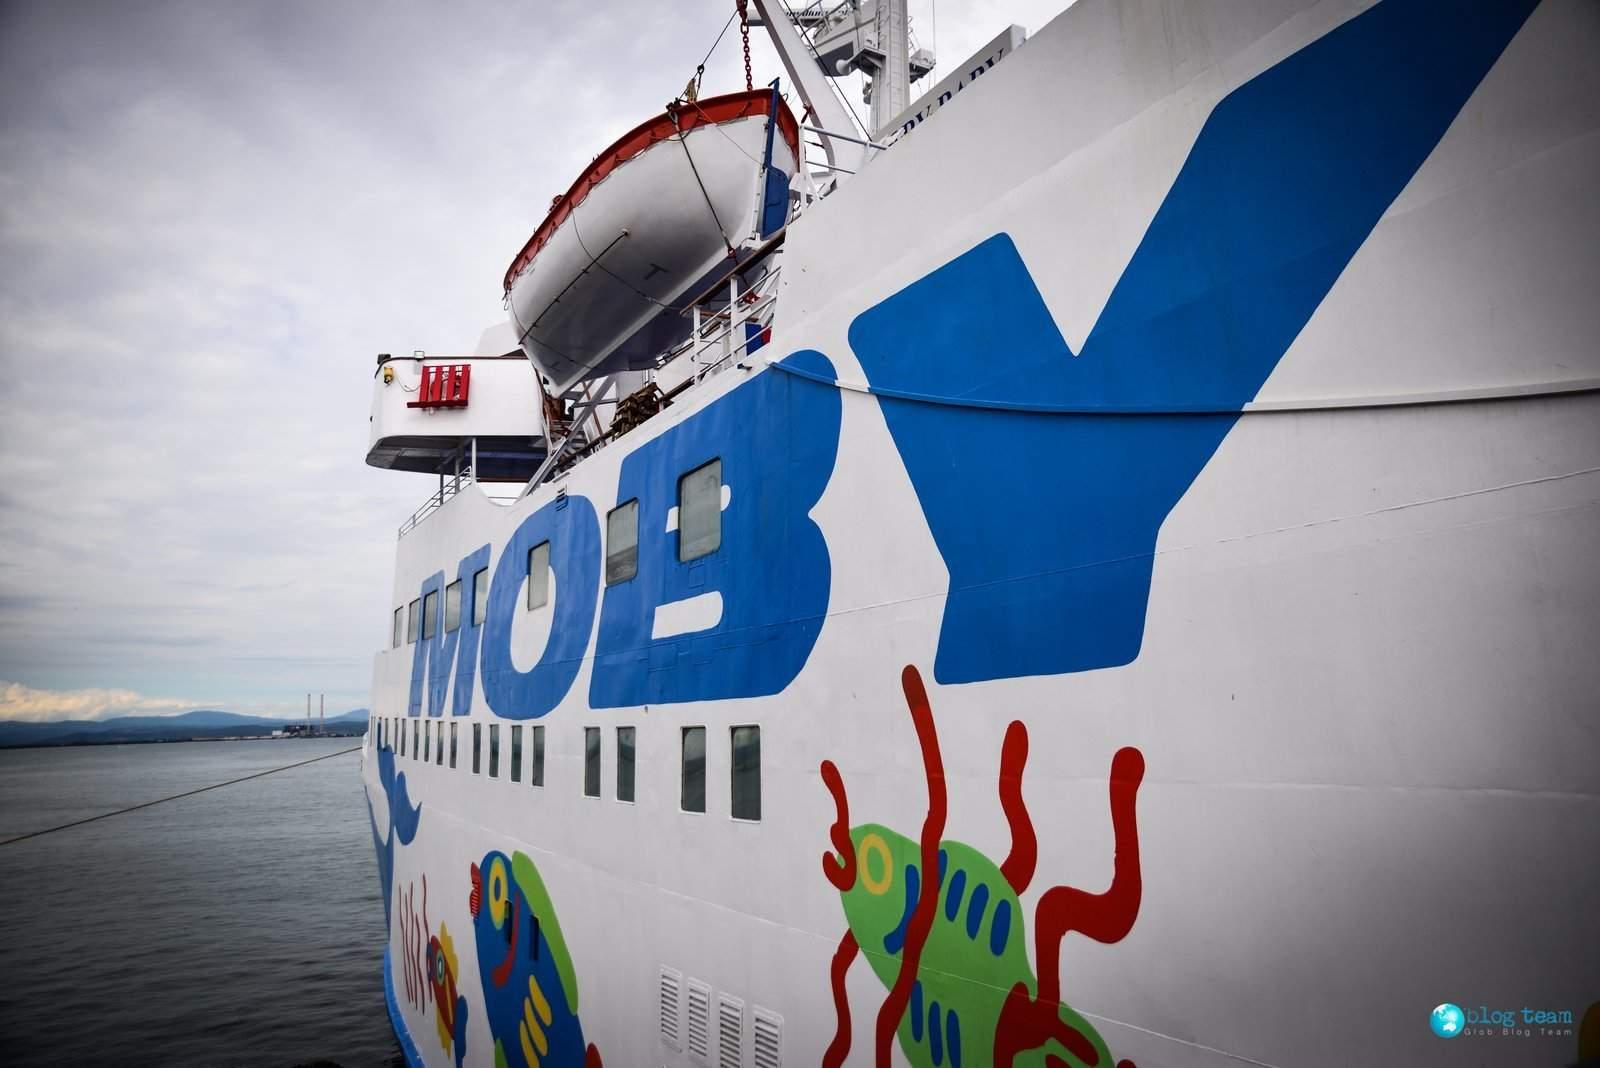 Moby ferry  - Piombino to Portoferraio